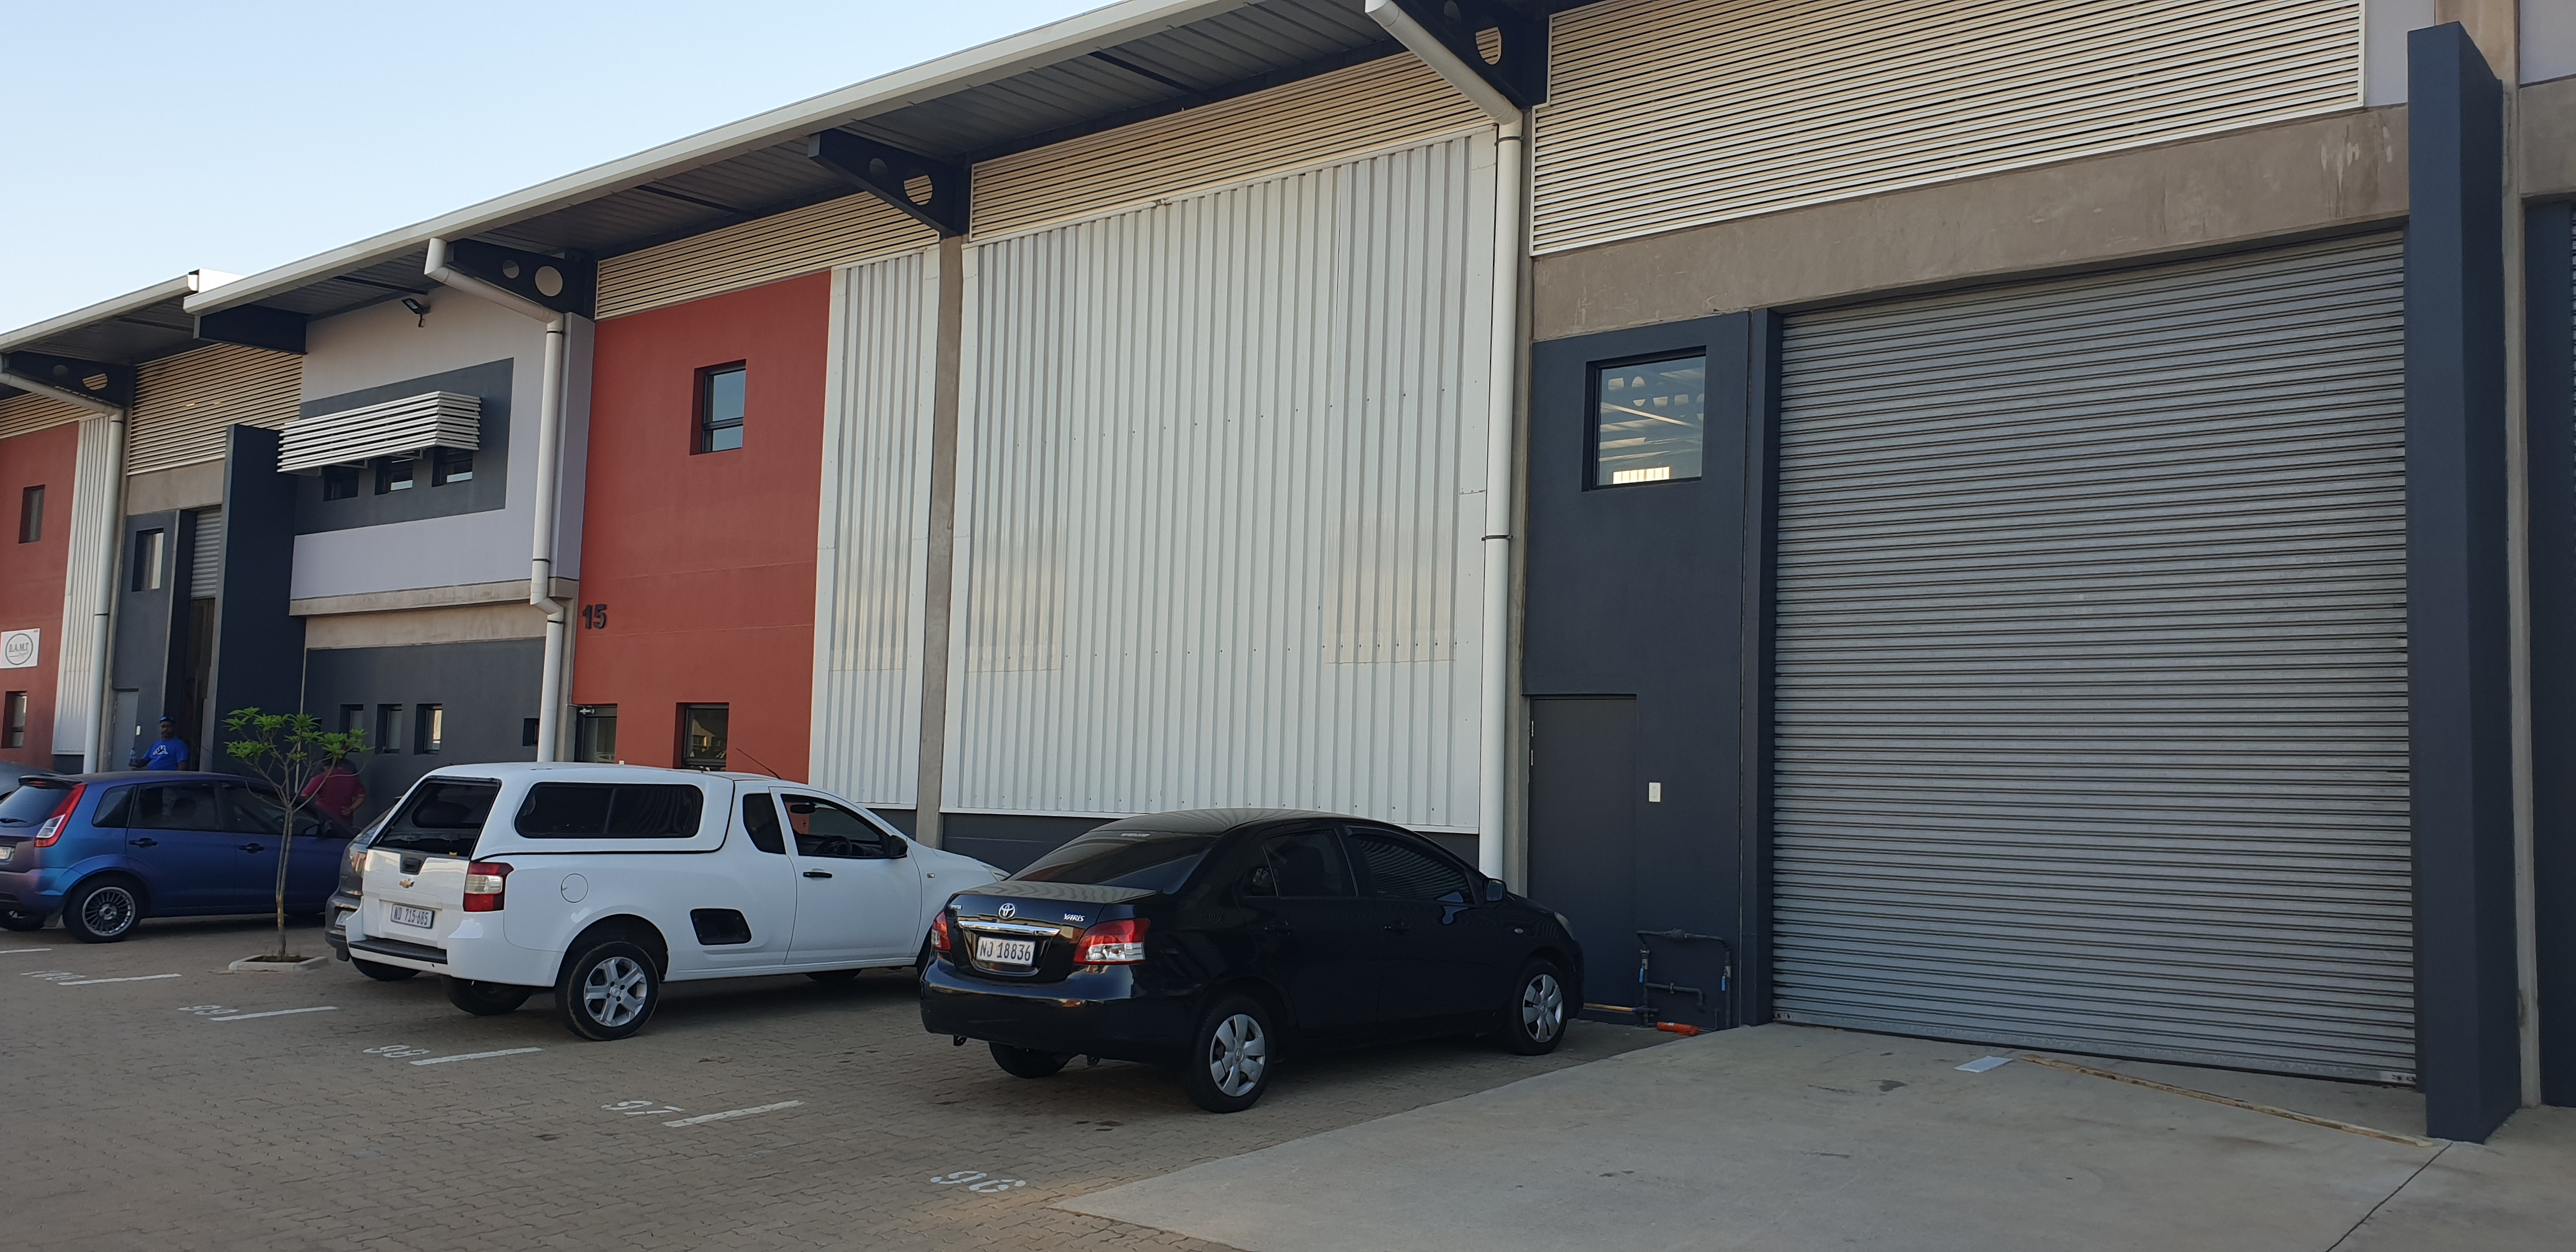 685m2 Warehouse To Let in Cornubia